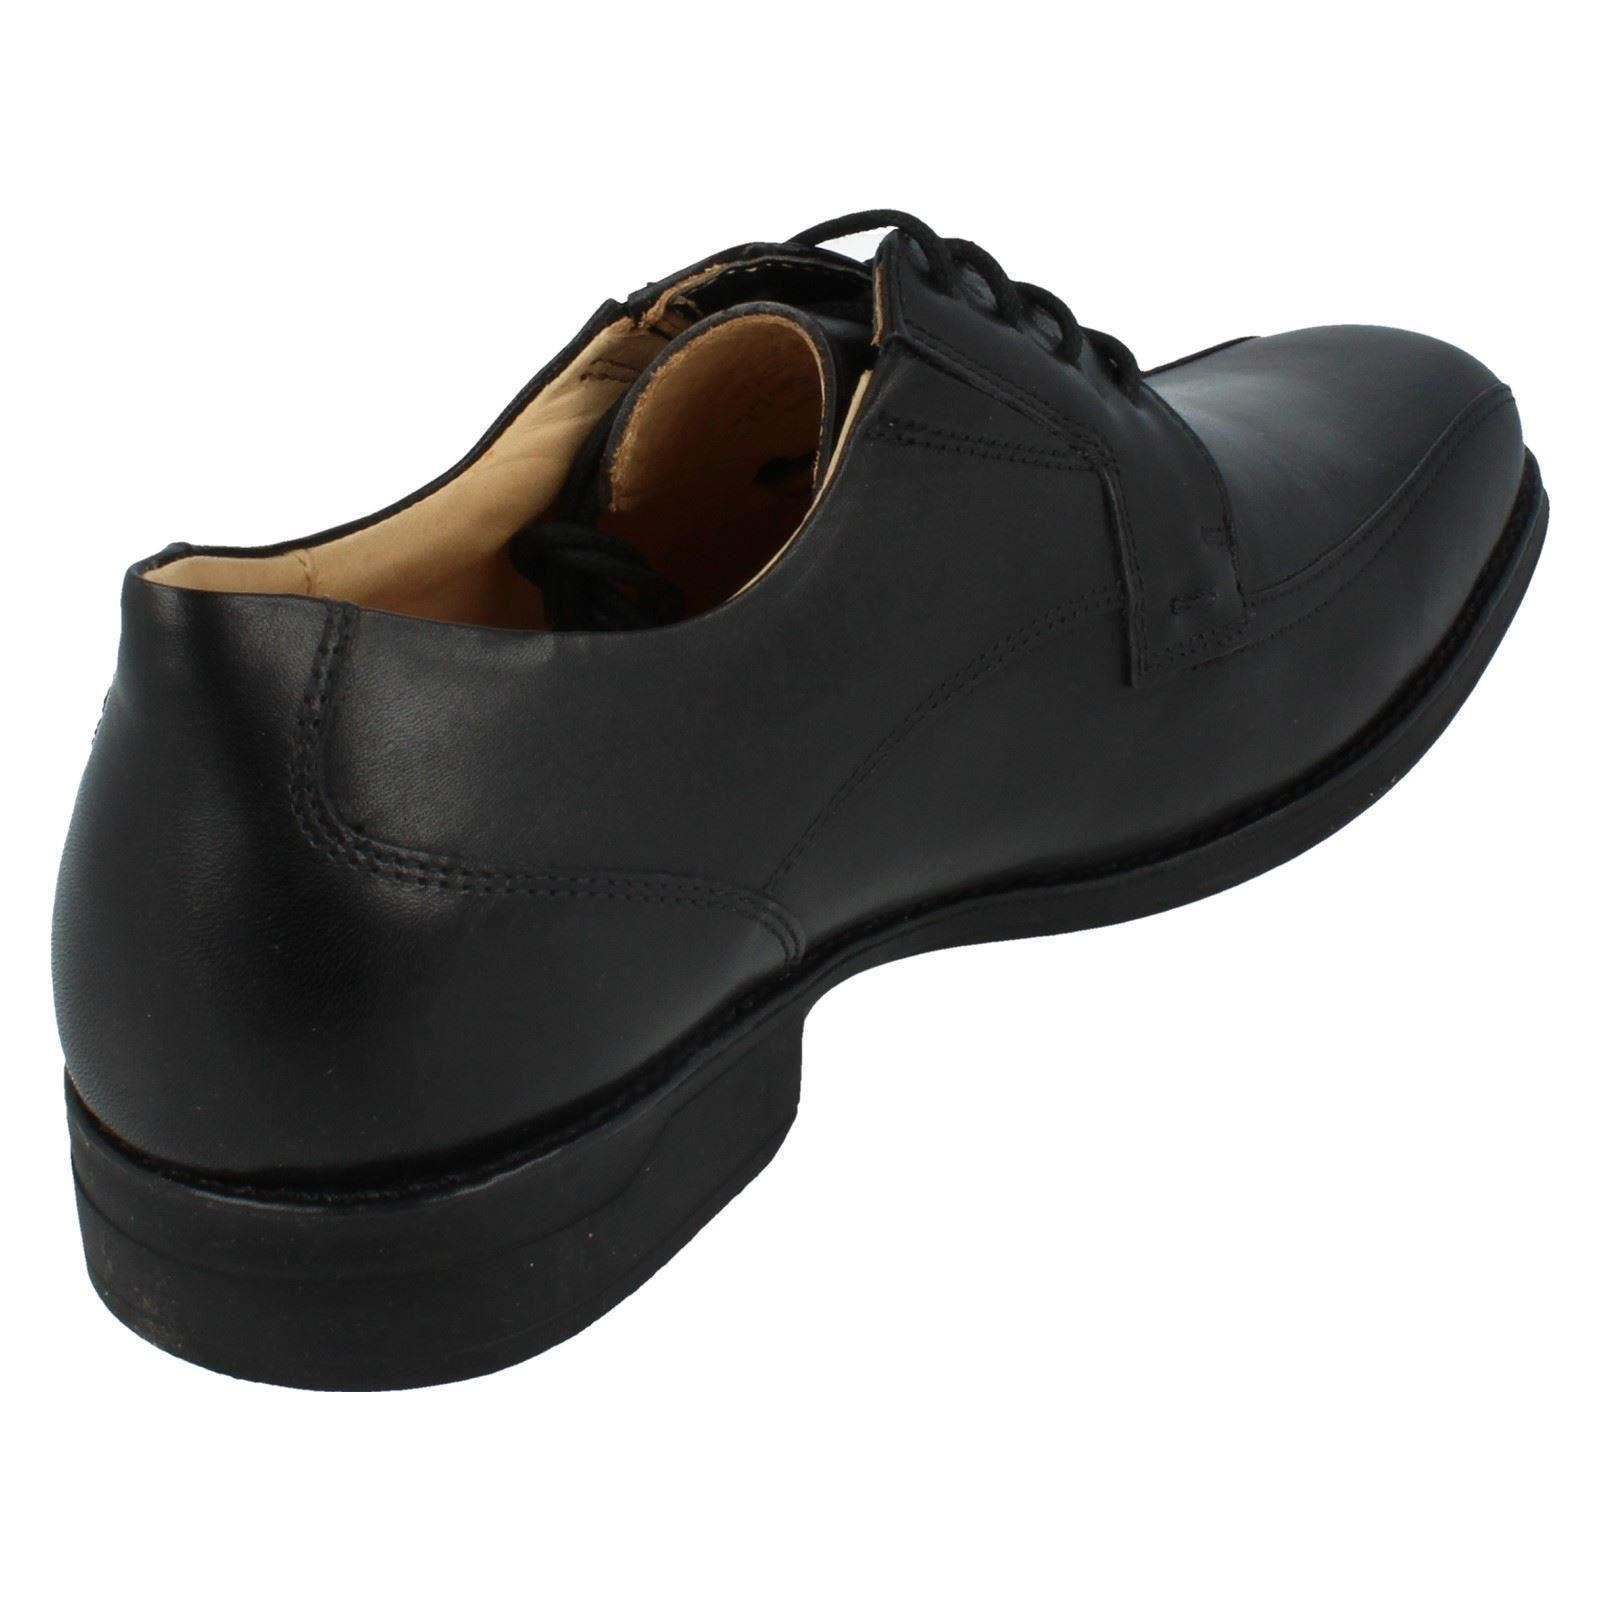 Mens Anatomic Leder & Co Gel Technology Leder Anatomic Lace Up Schuhes - Formoso 4ad8a7